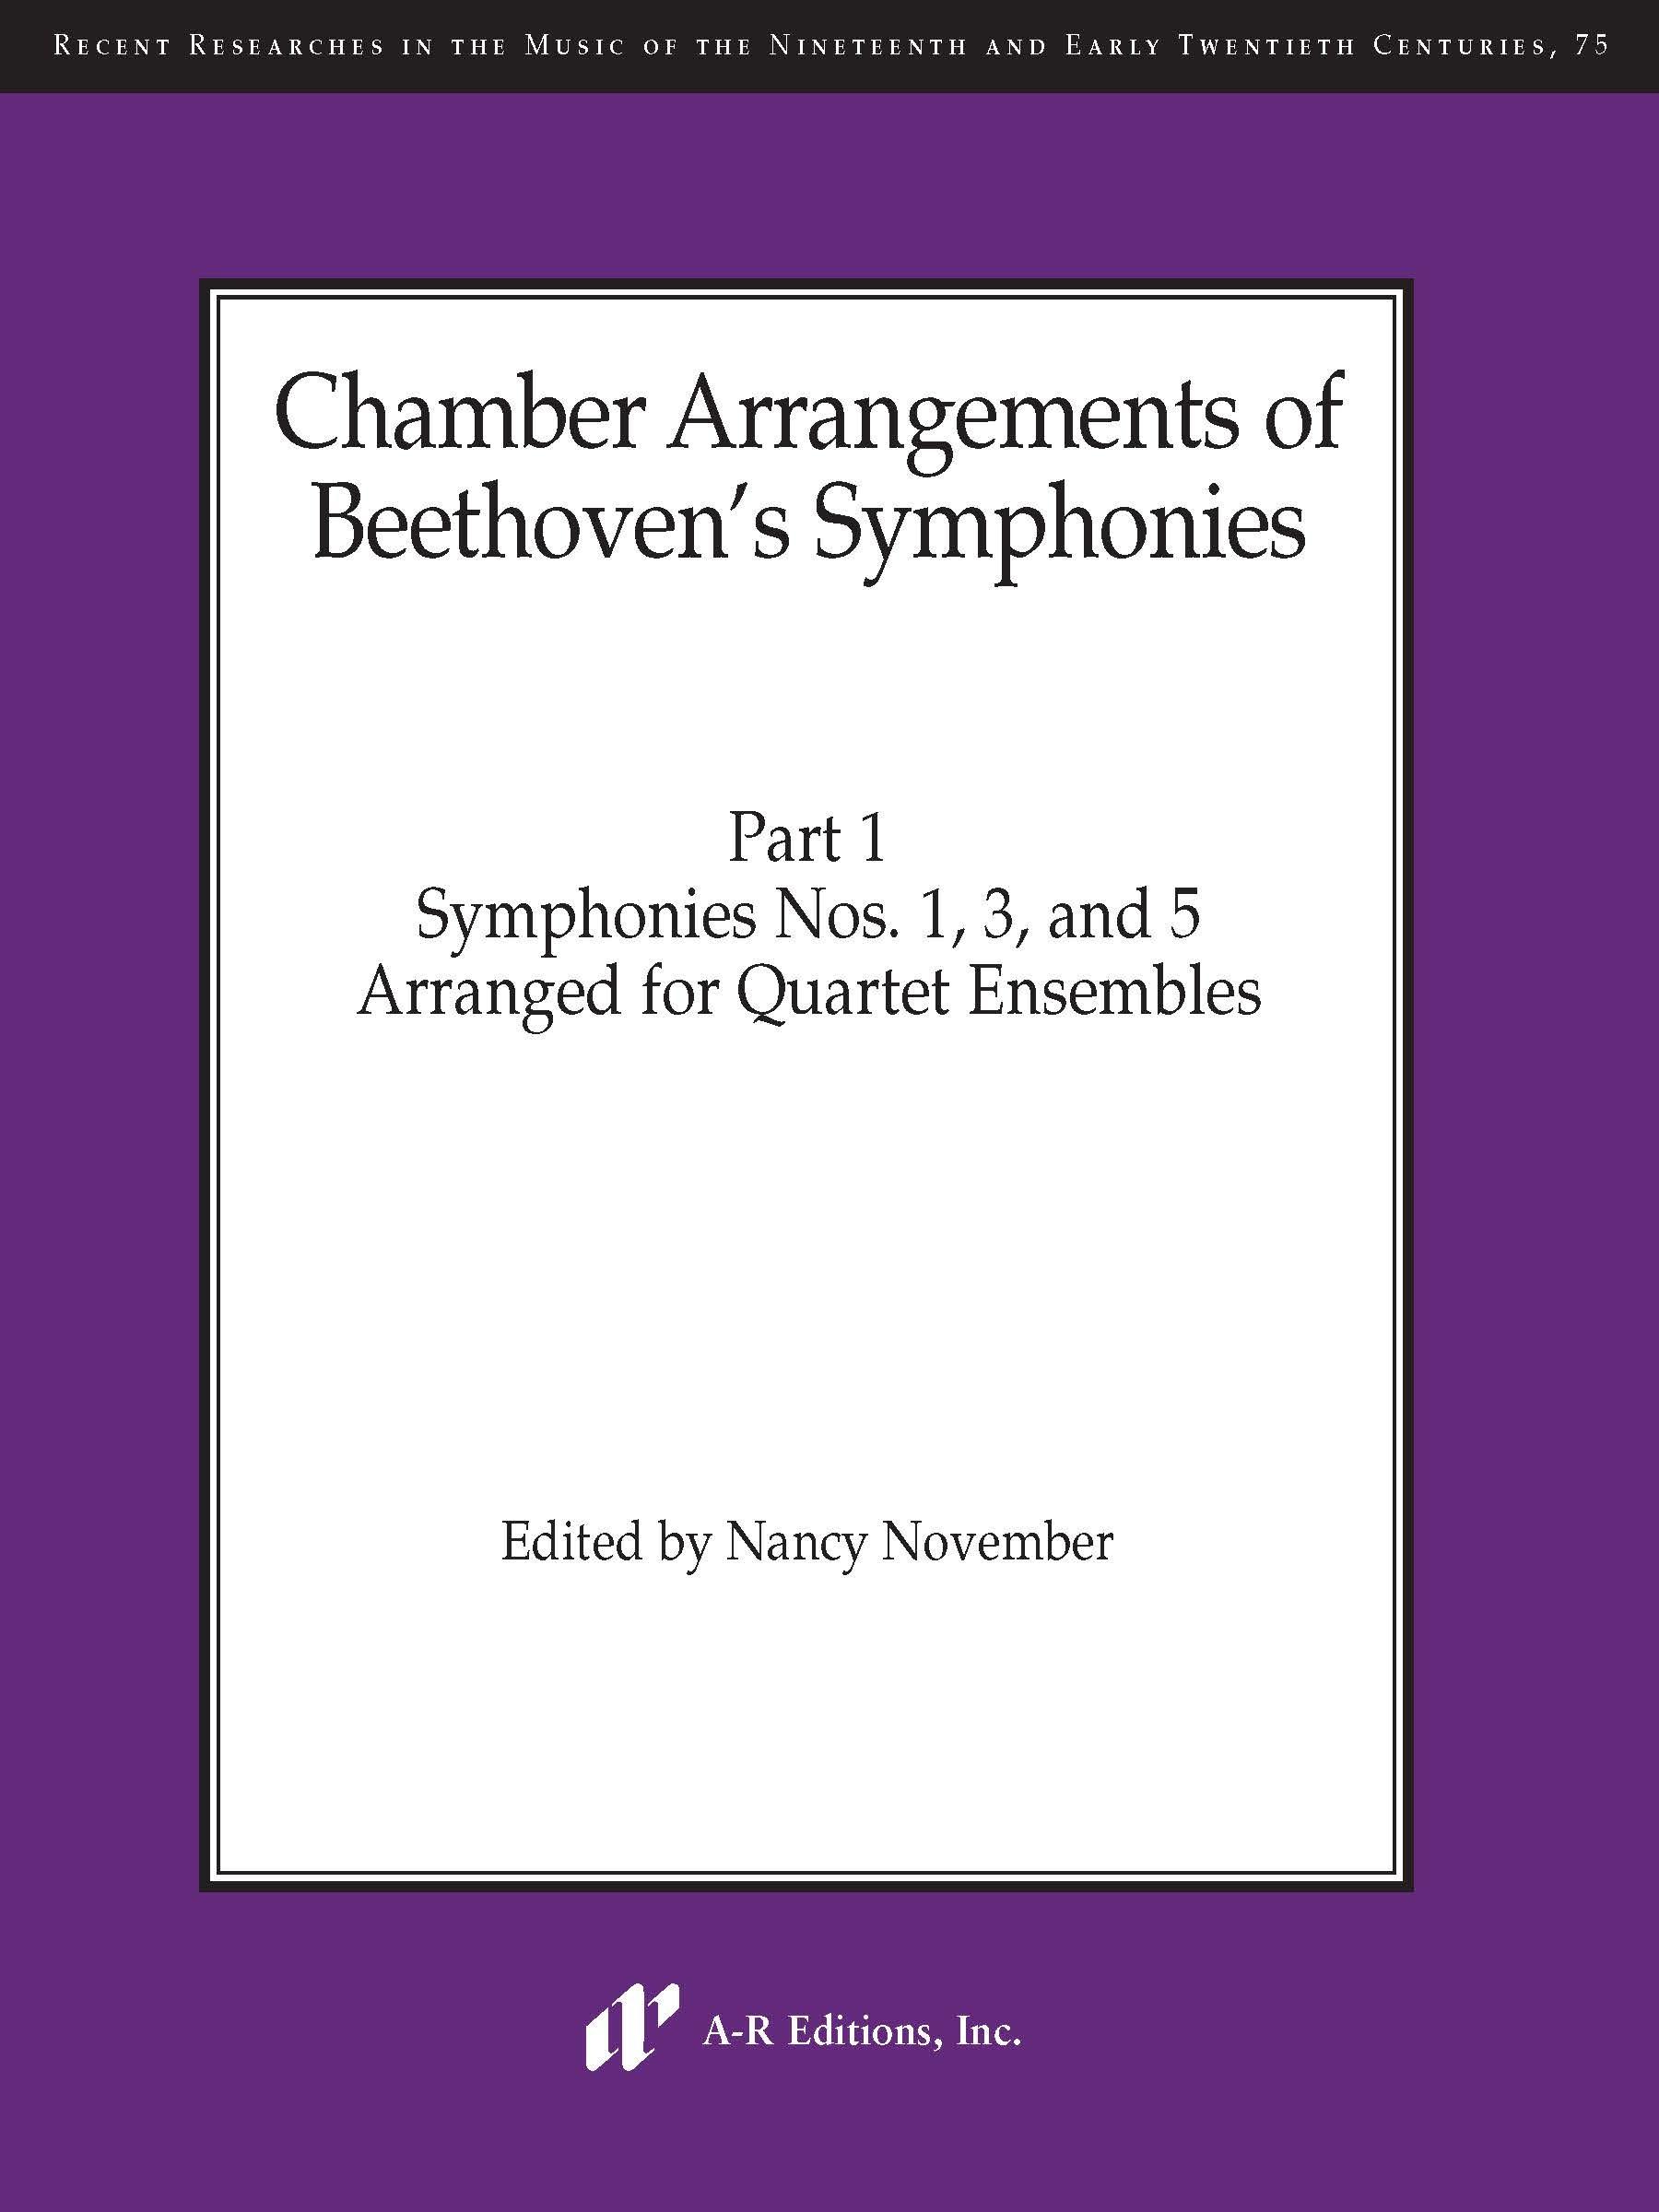 Chamber Arrangements of Beethoven's Symphonies, Part 1